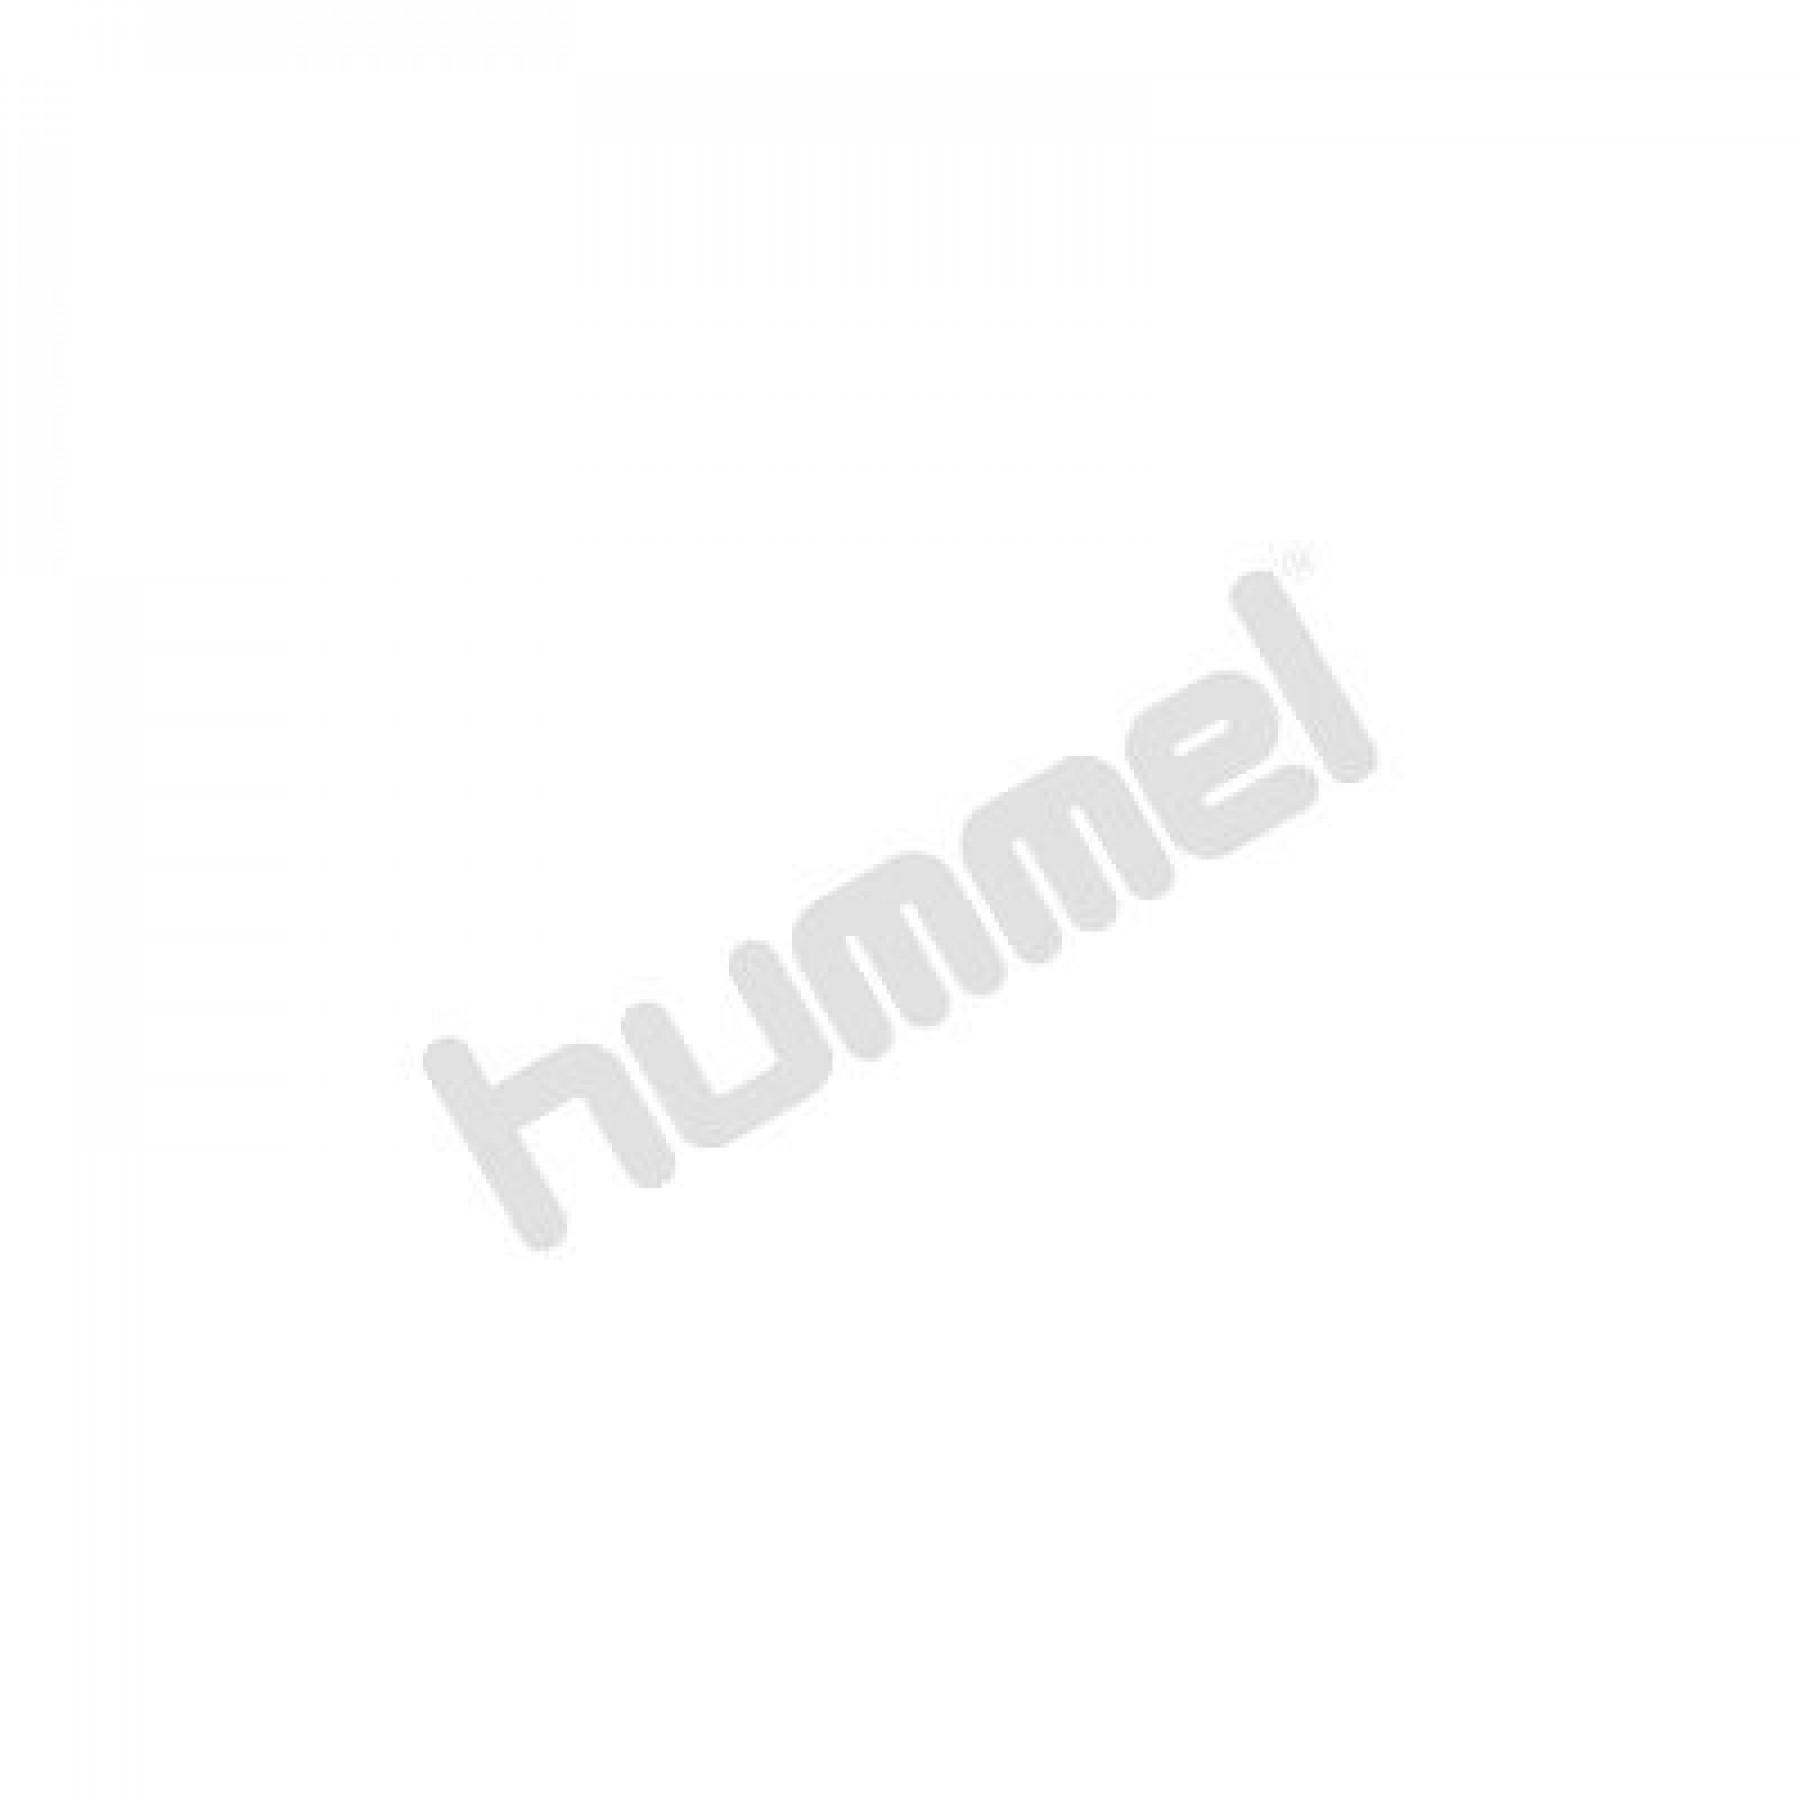 Women's dress Hummel hmlzandra